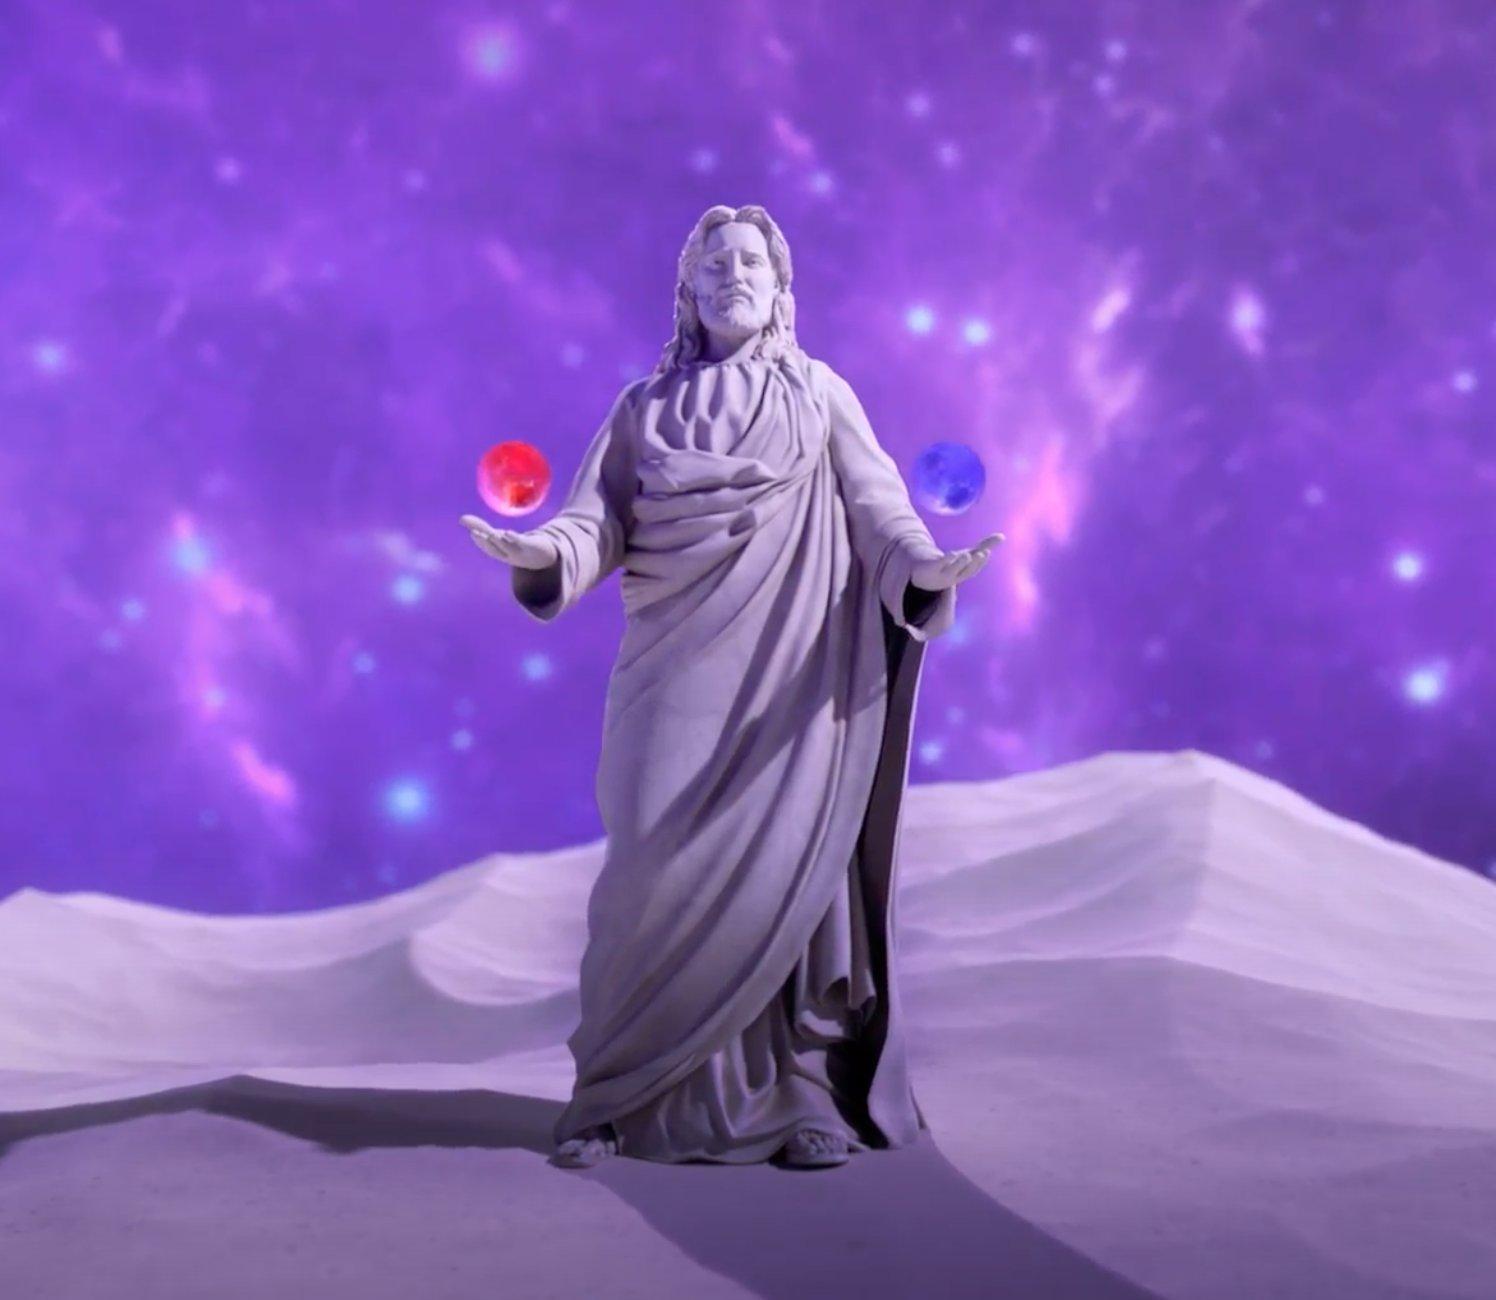 Purple Dreams by Murat Saygıner-nft-drop